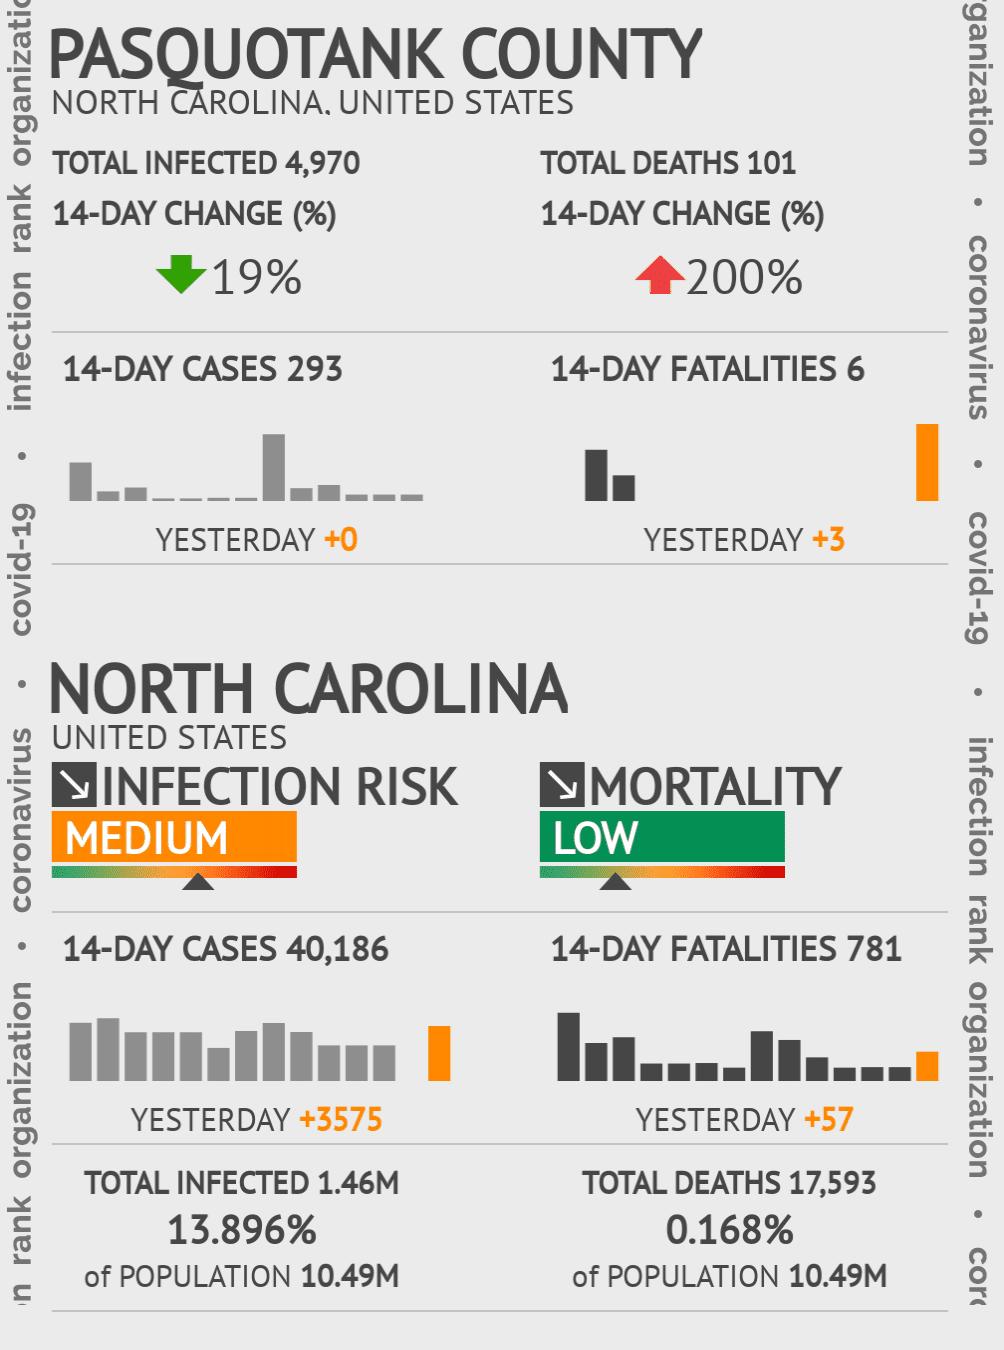 Pasquotank County Coronavirus Covid-19 Risk of Infection on November 24, 2020